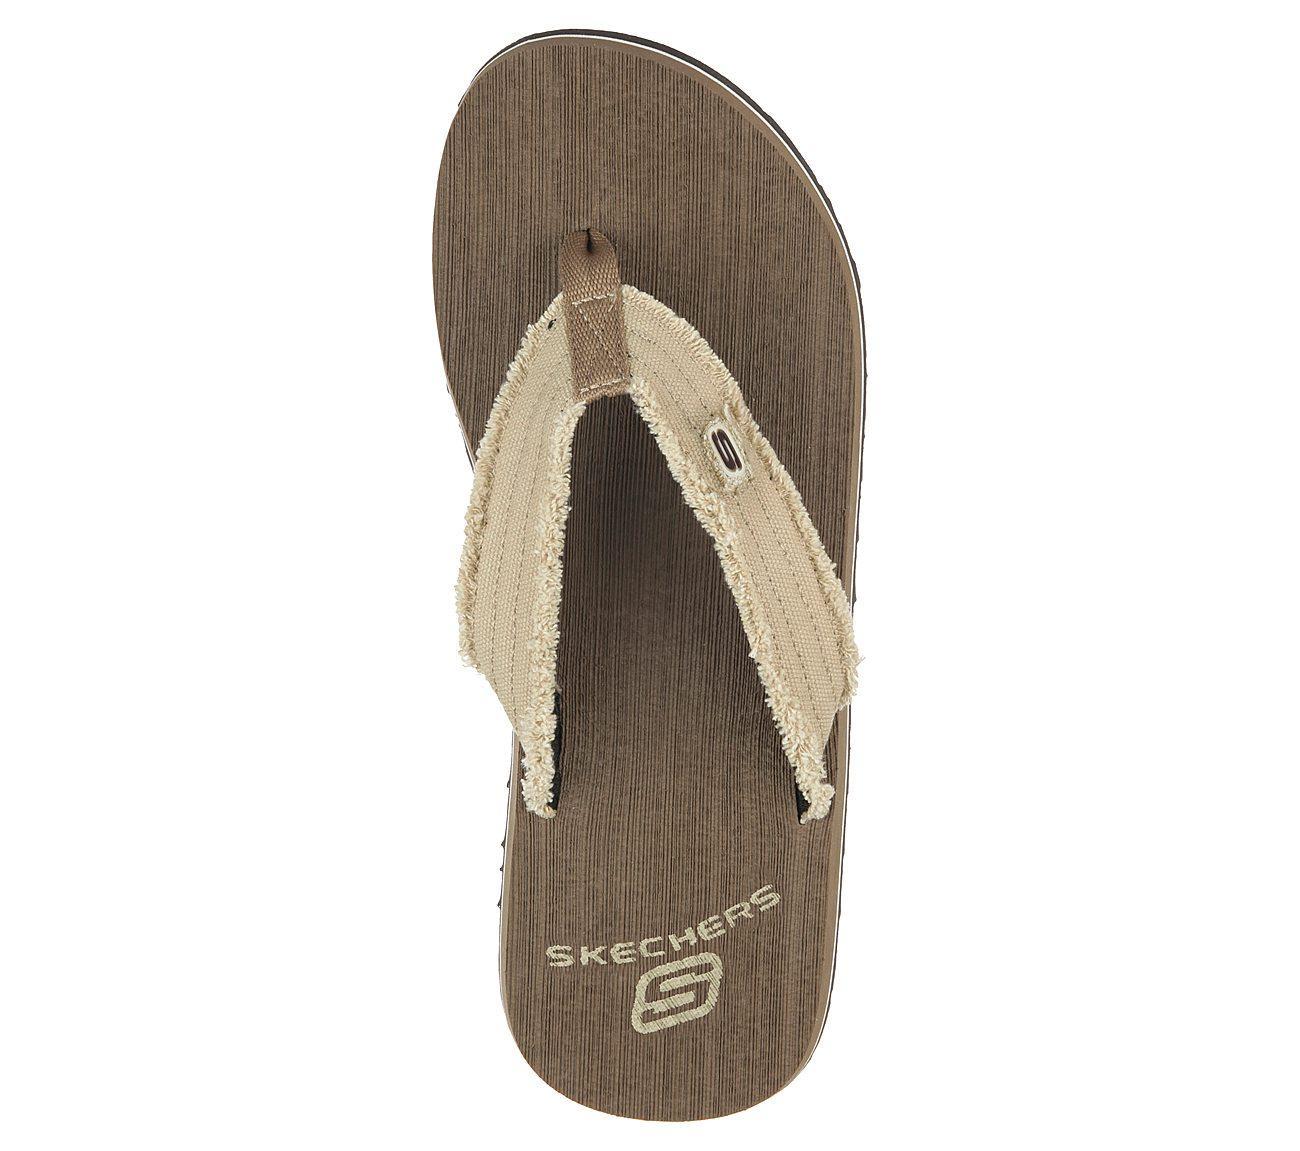 Skechers Surf Combers Flip Flops Size 9 Color Brown for sale